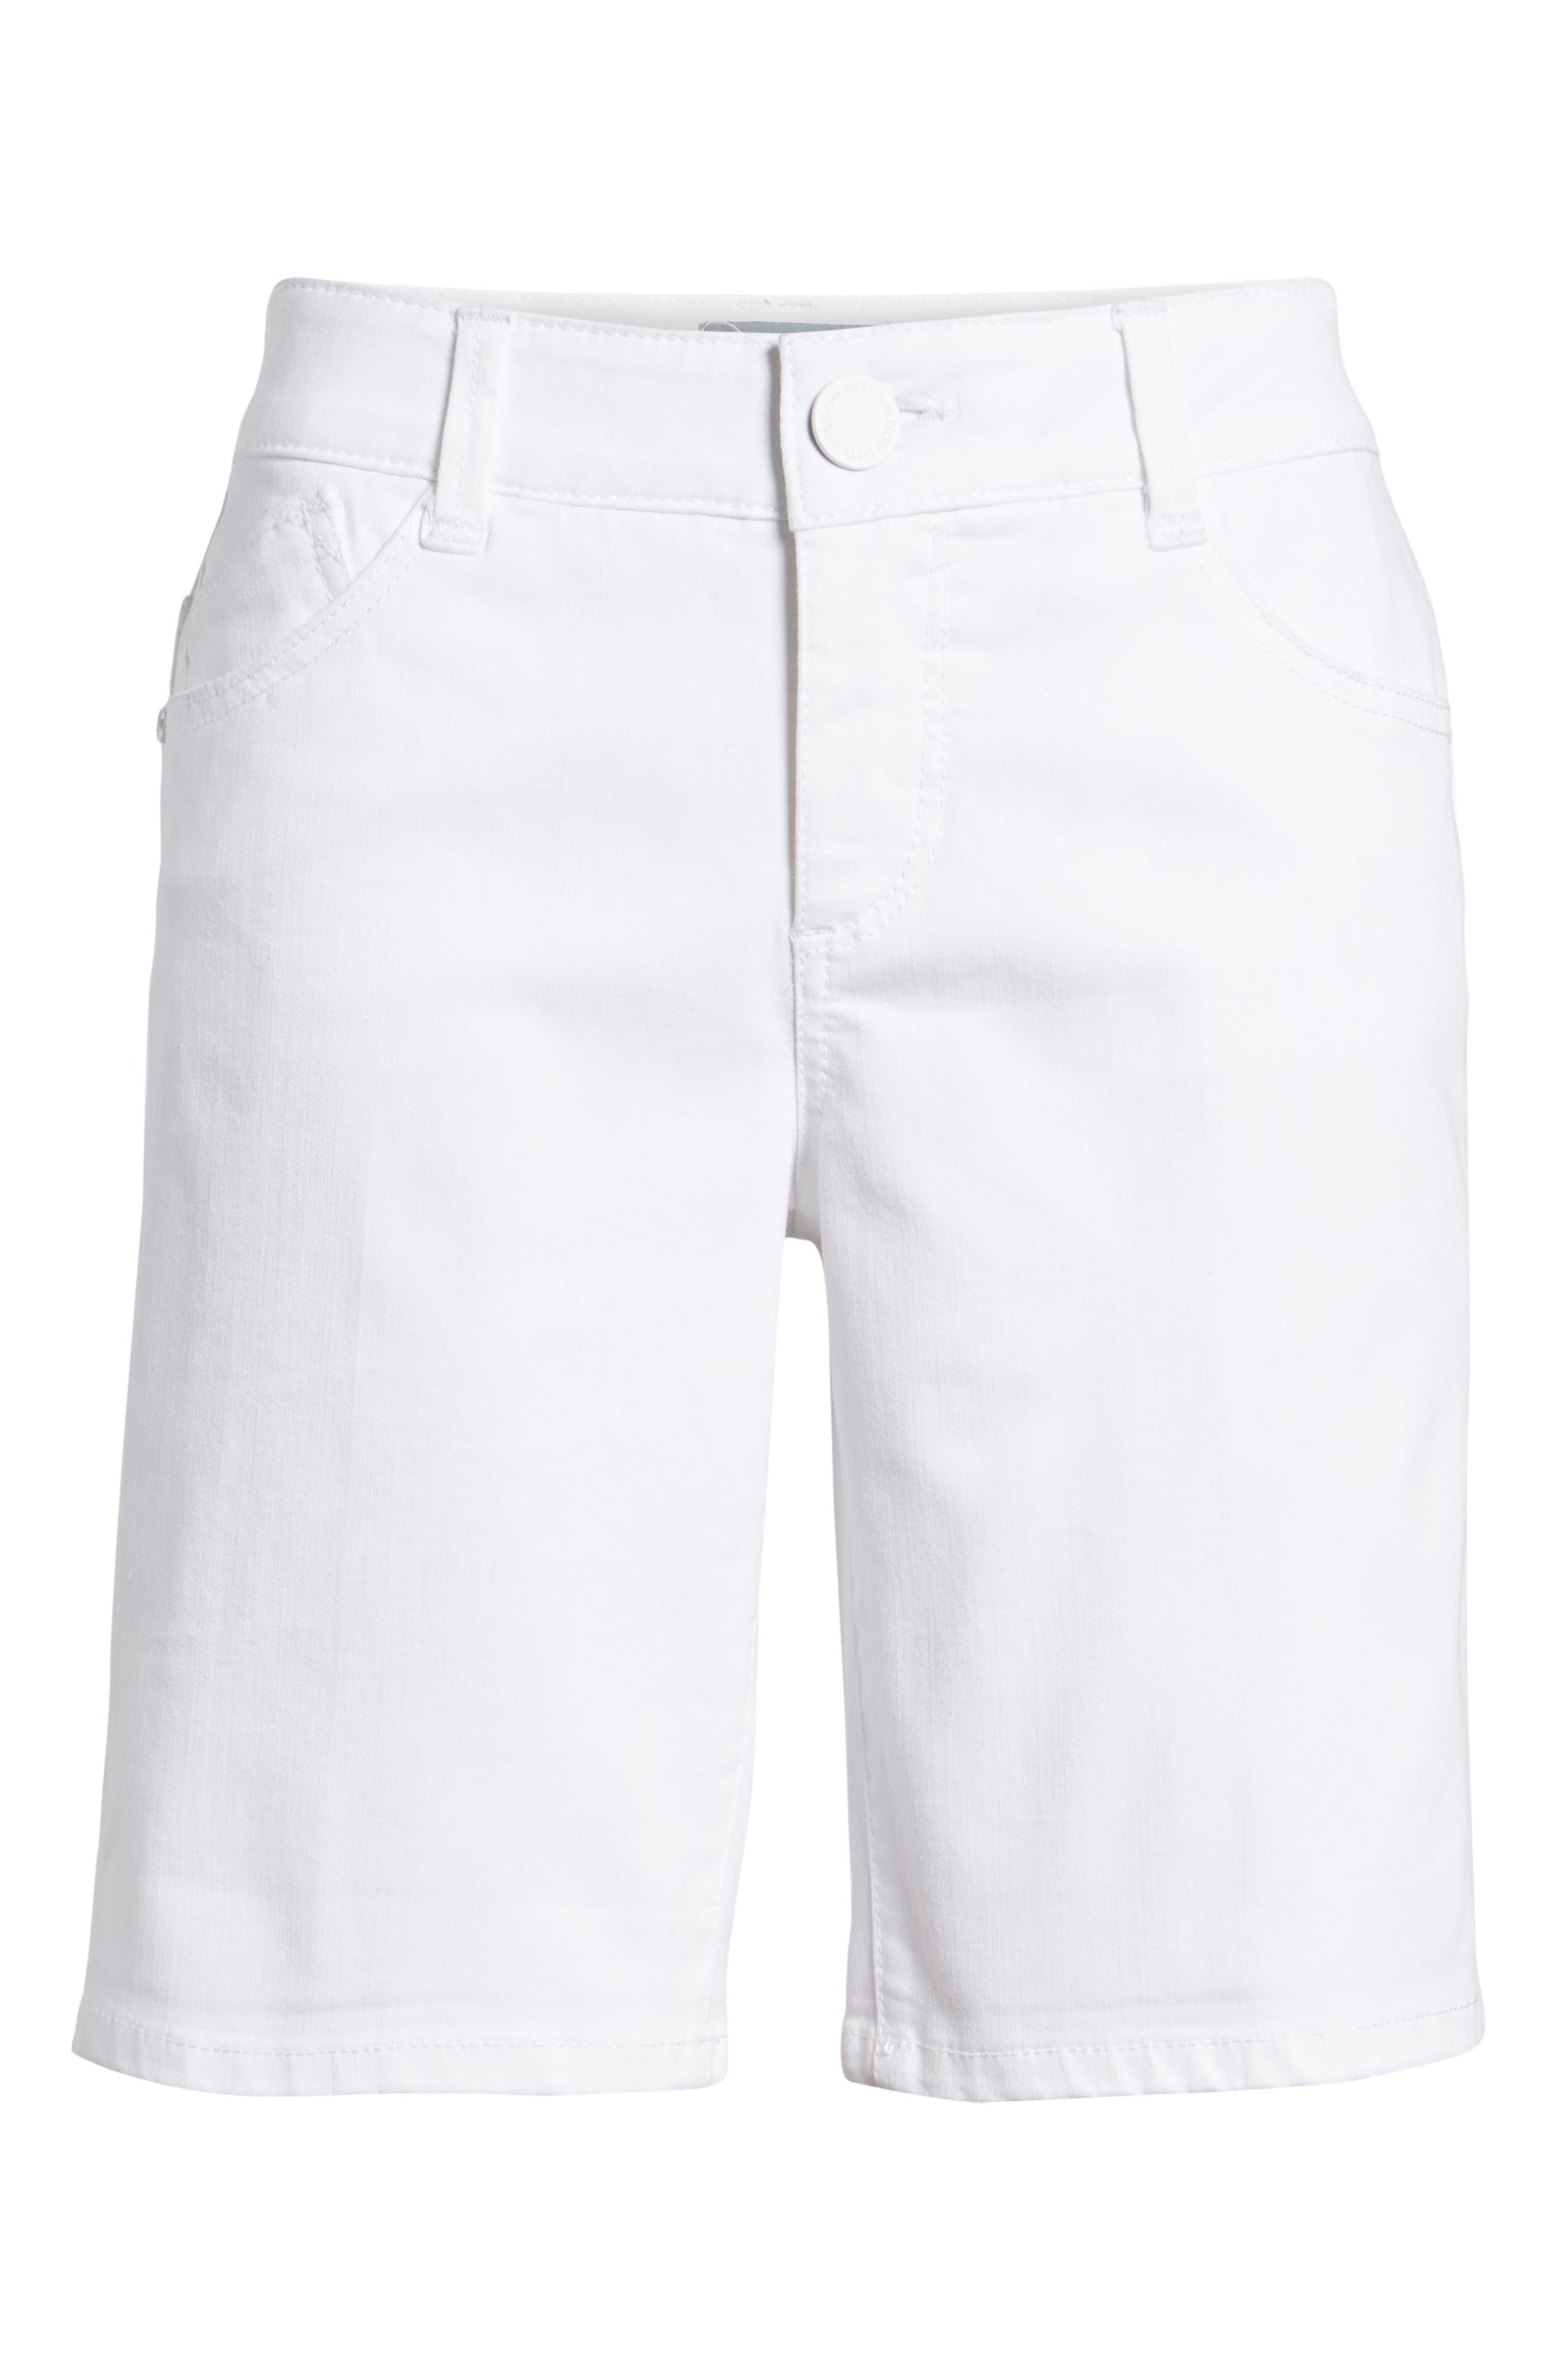 Ab-Solution White Denim Shorts,                             Alternate thumbnail 6, color,                             Optic White